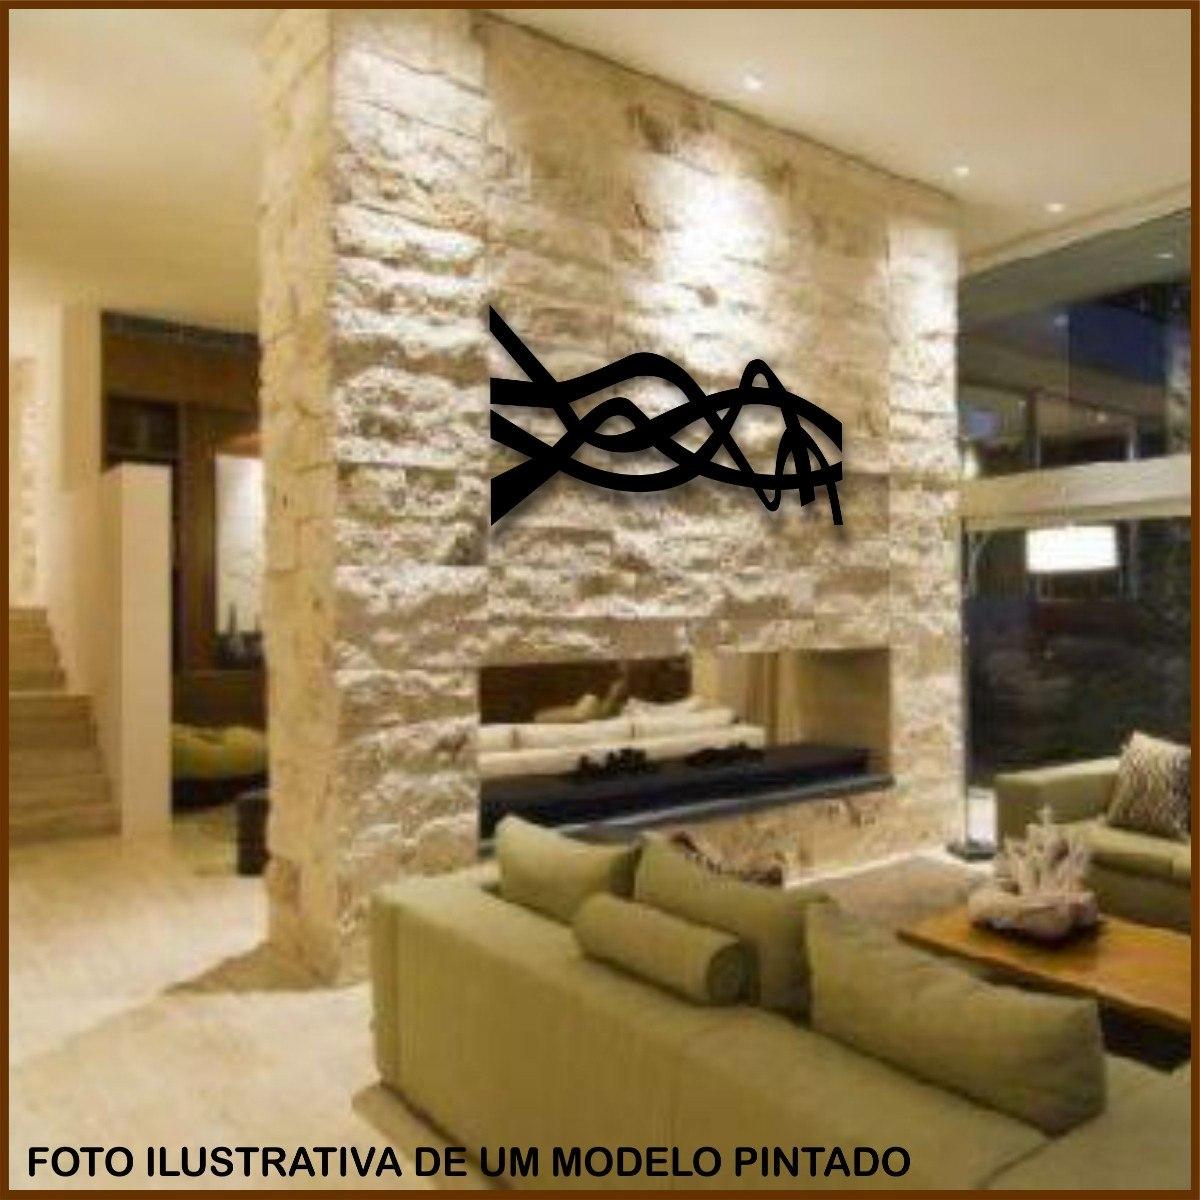 De Parede Escultura 1 Metro  Mdf Cru R$ 79 90 no MercadoLivre #614016 1200x1200